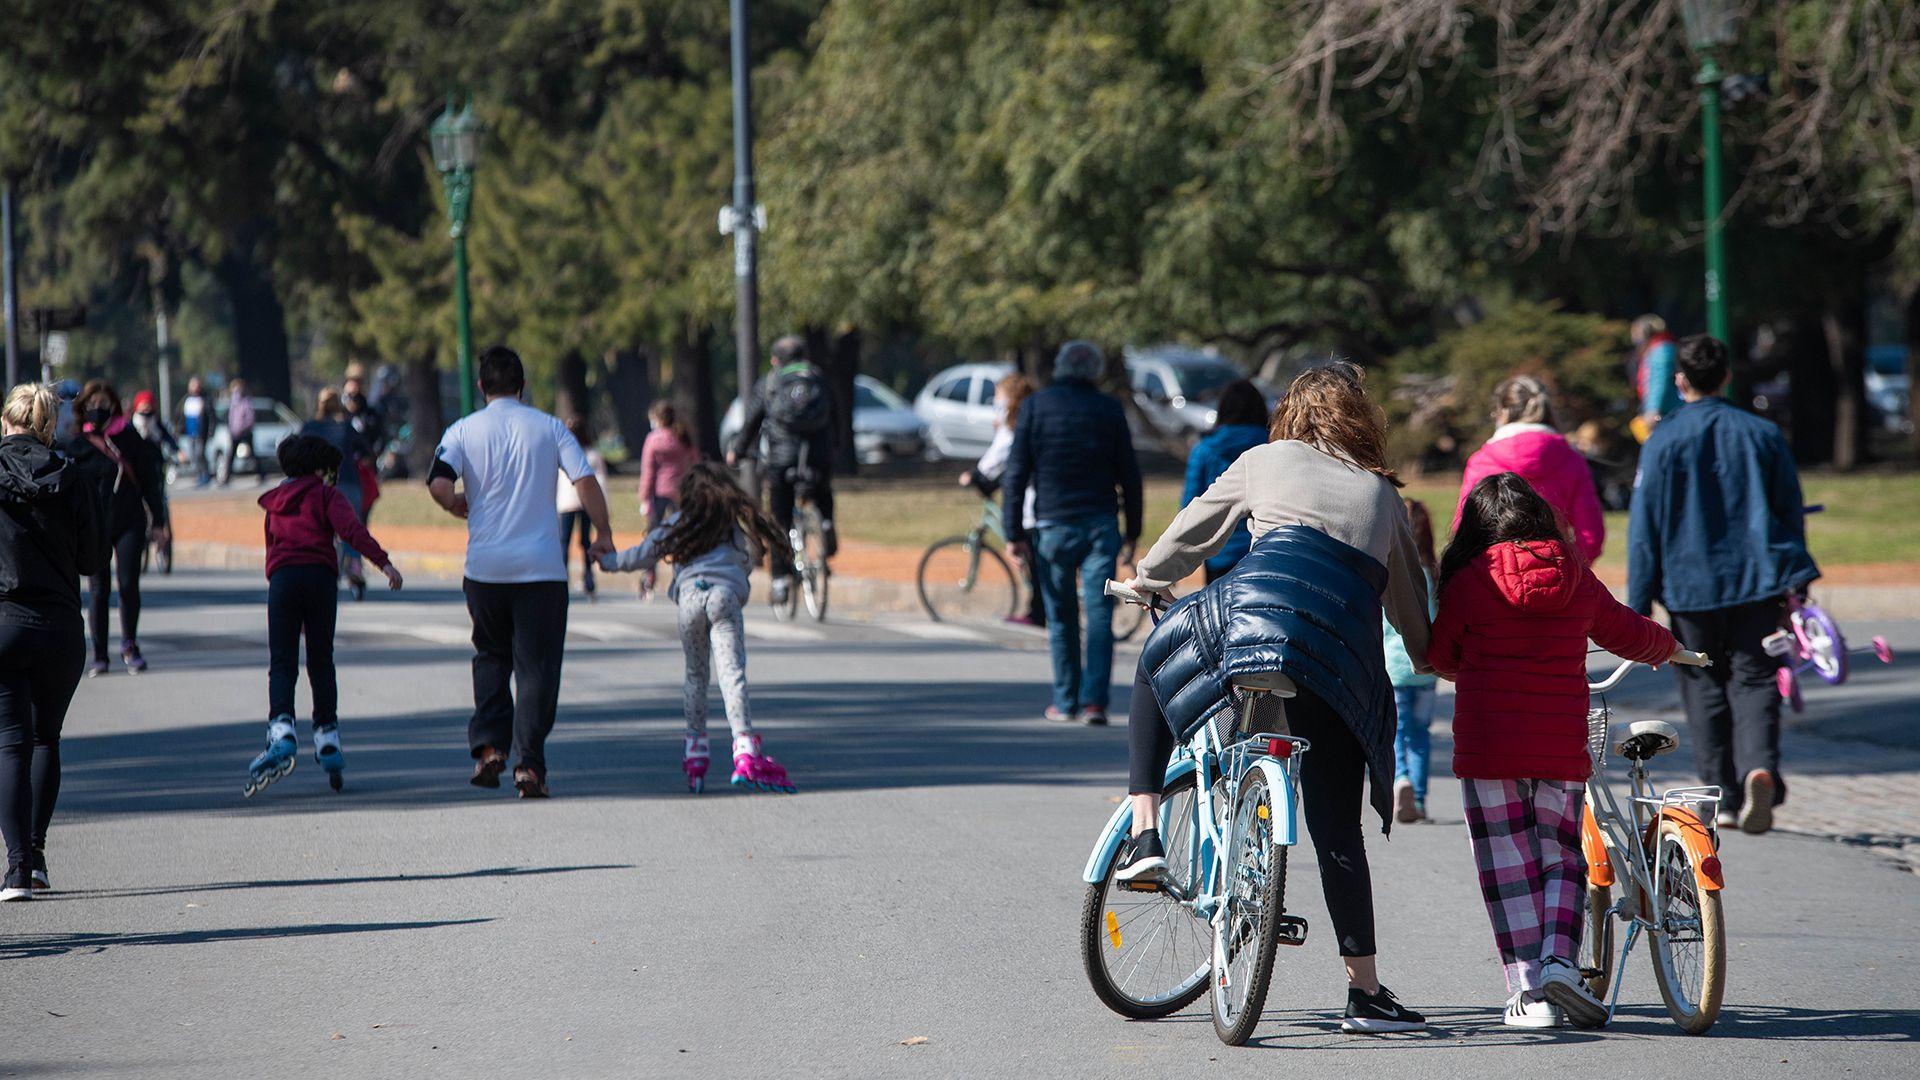 Dia del Niño - Cuarentena Obligatoria - COVID-19 - Coronavirus - Salidas recreativas - Gente paseando - Buenos Aires, Argentina